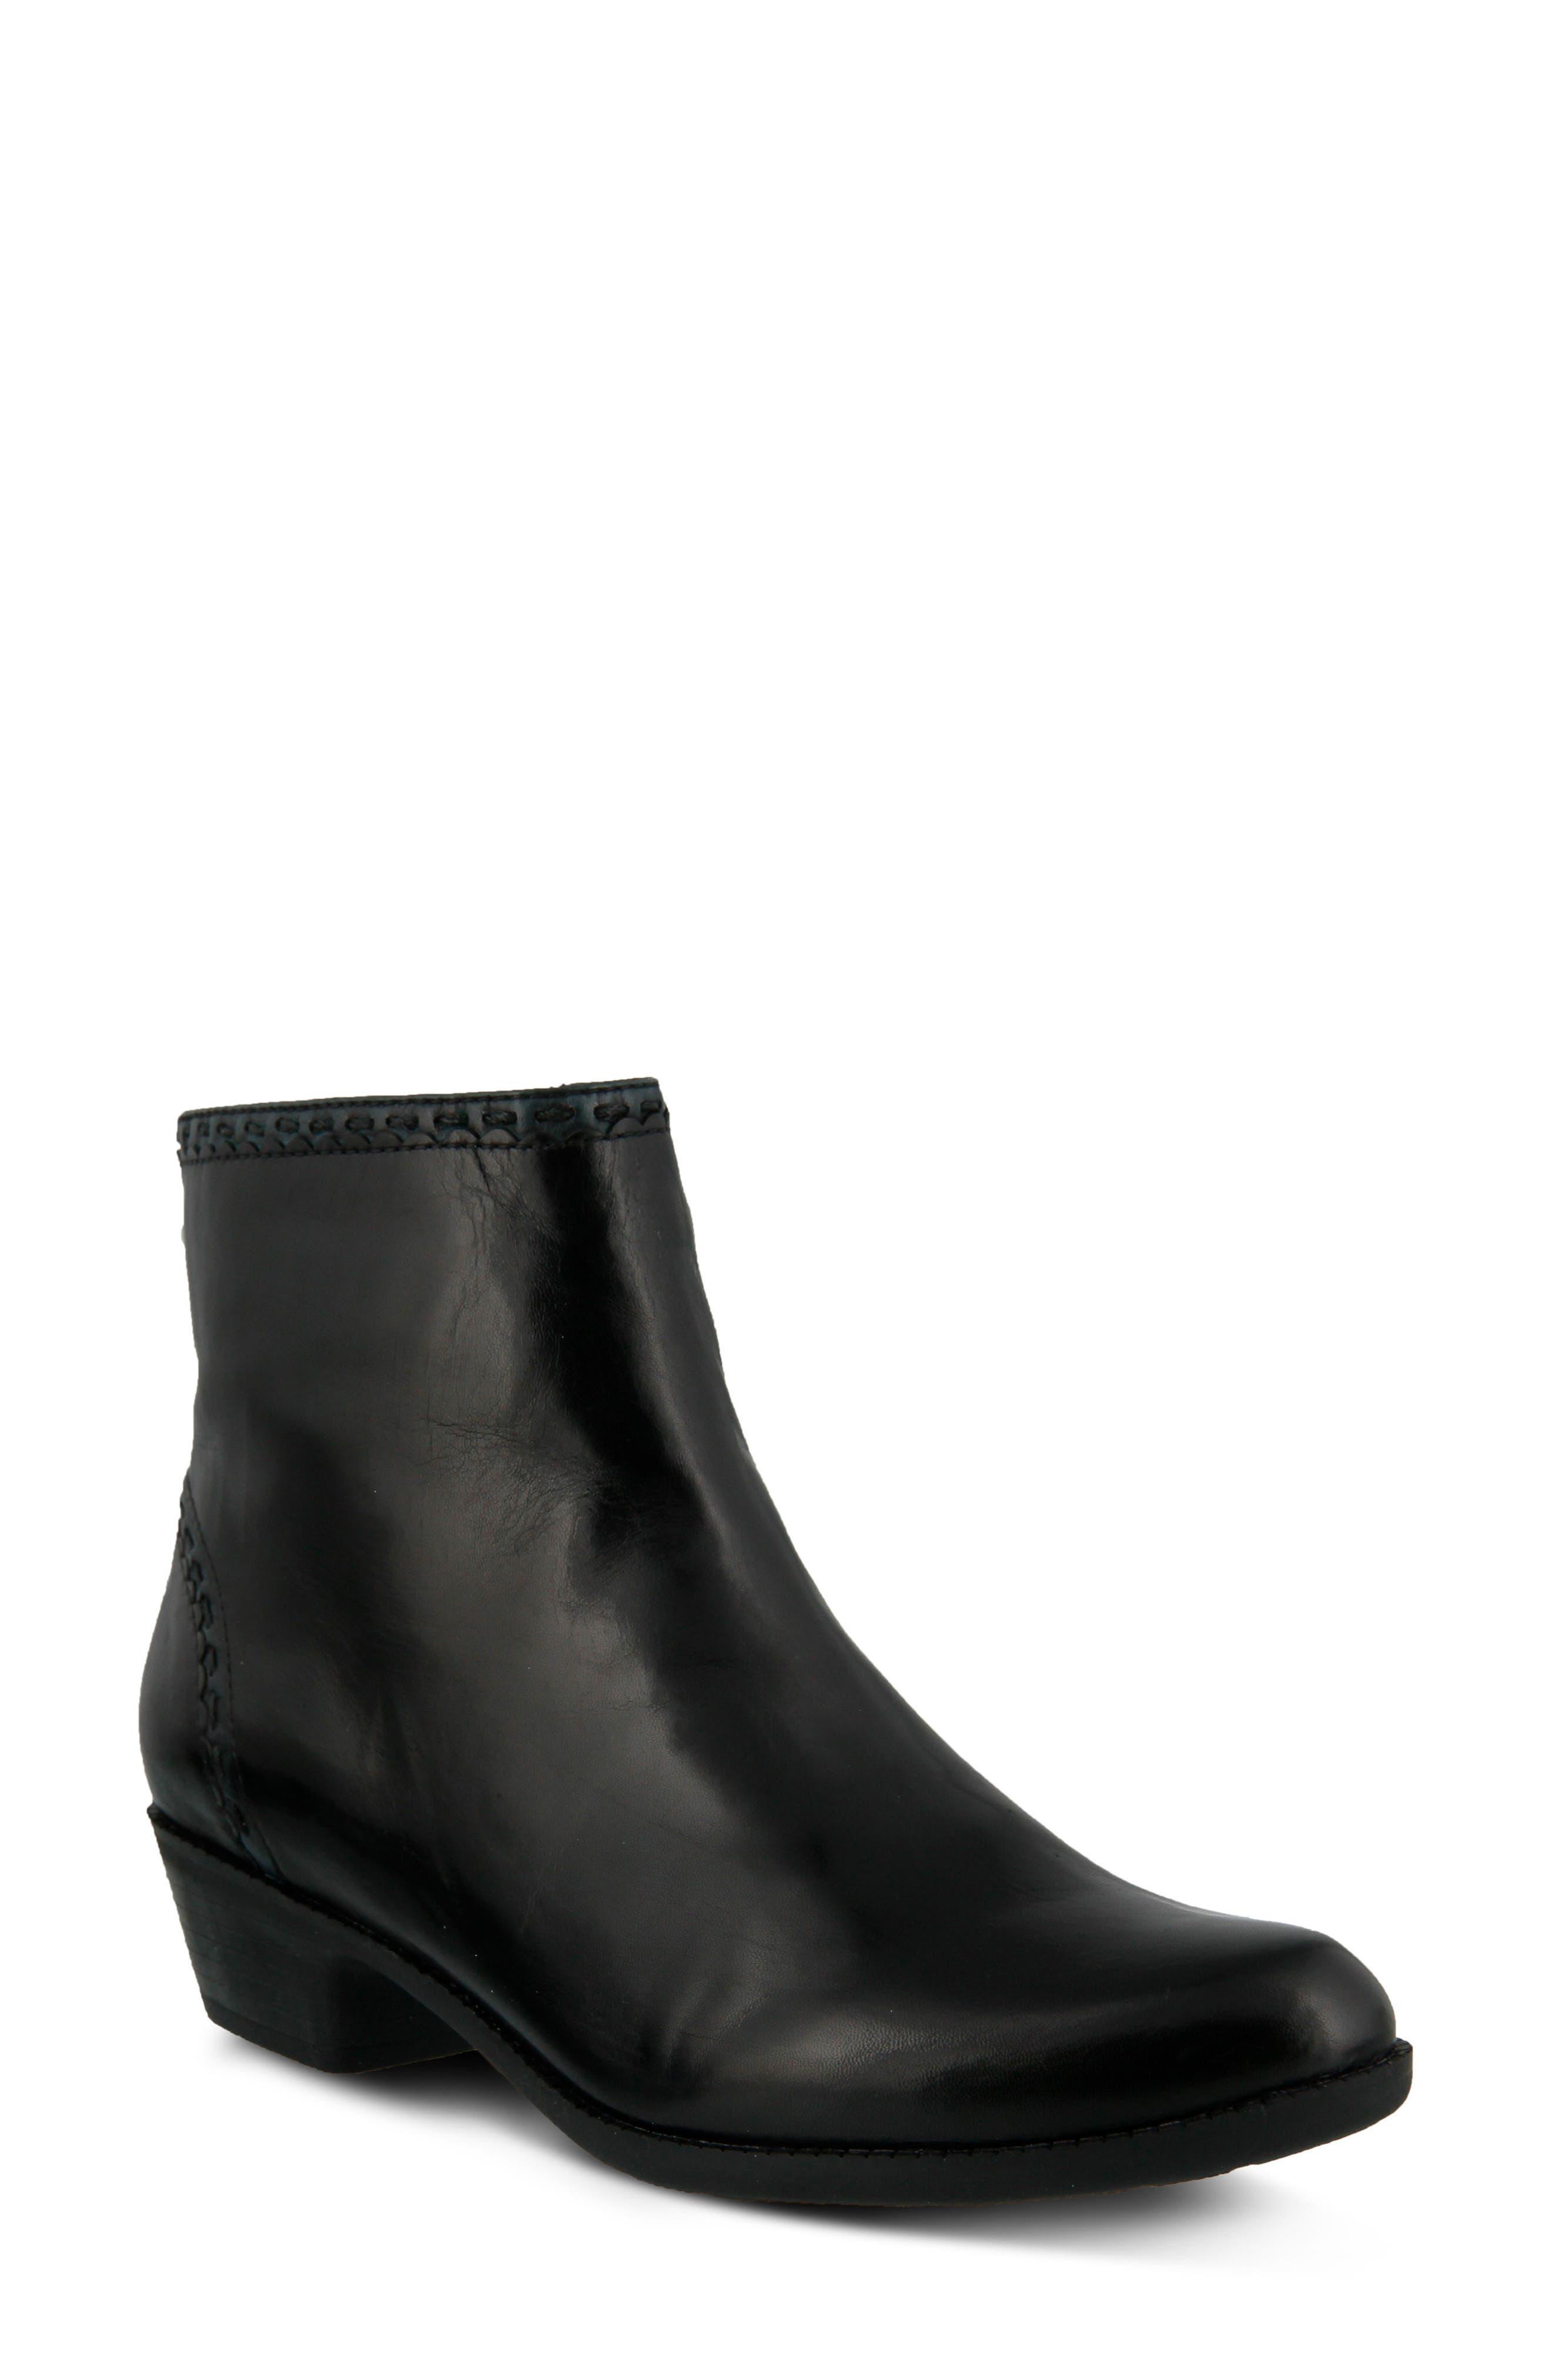 Micaela Bootie,                         Main,                         color, Black Leather